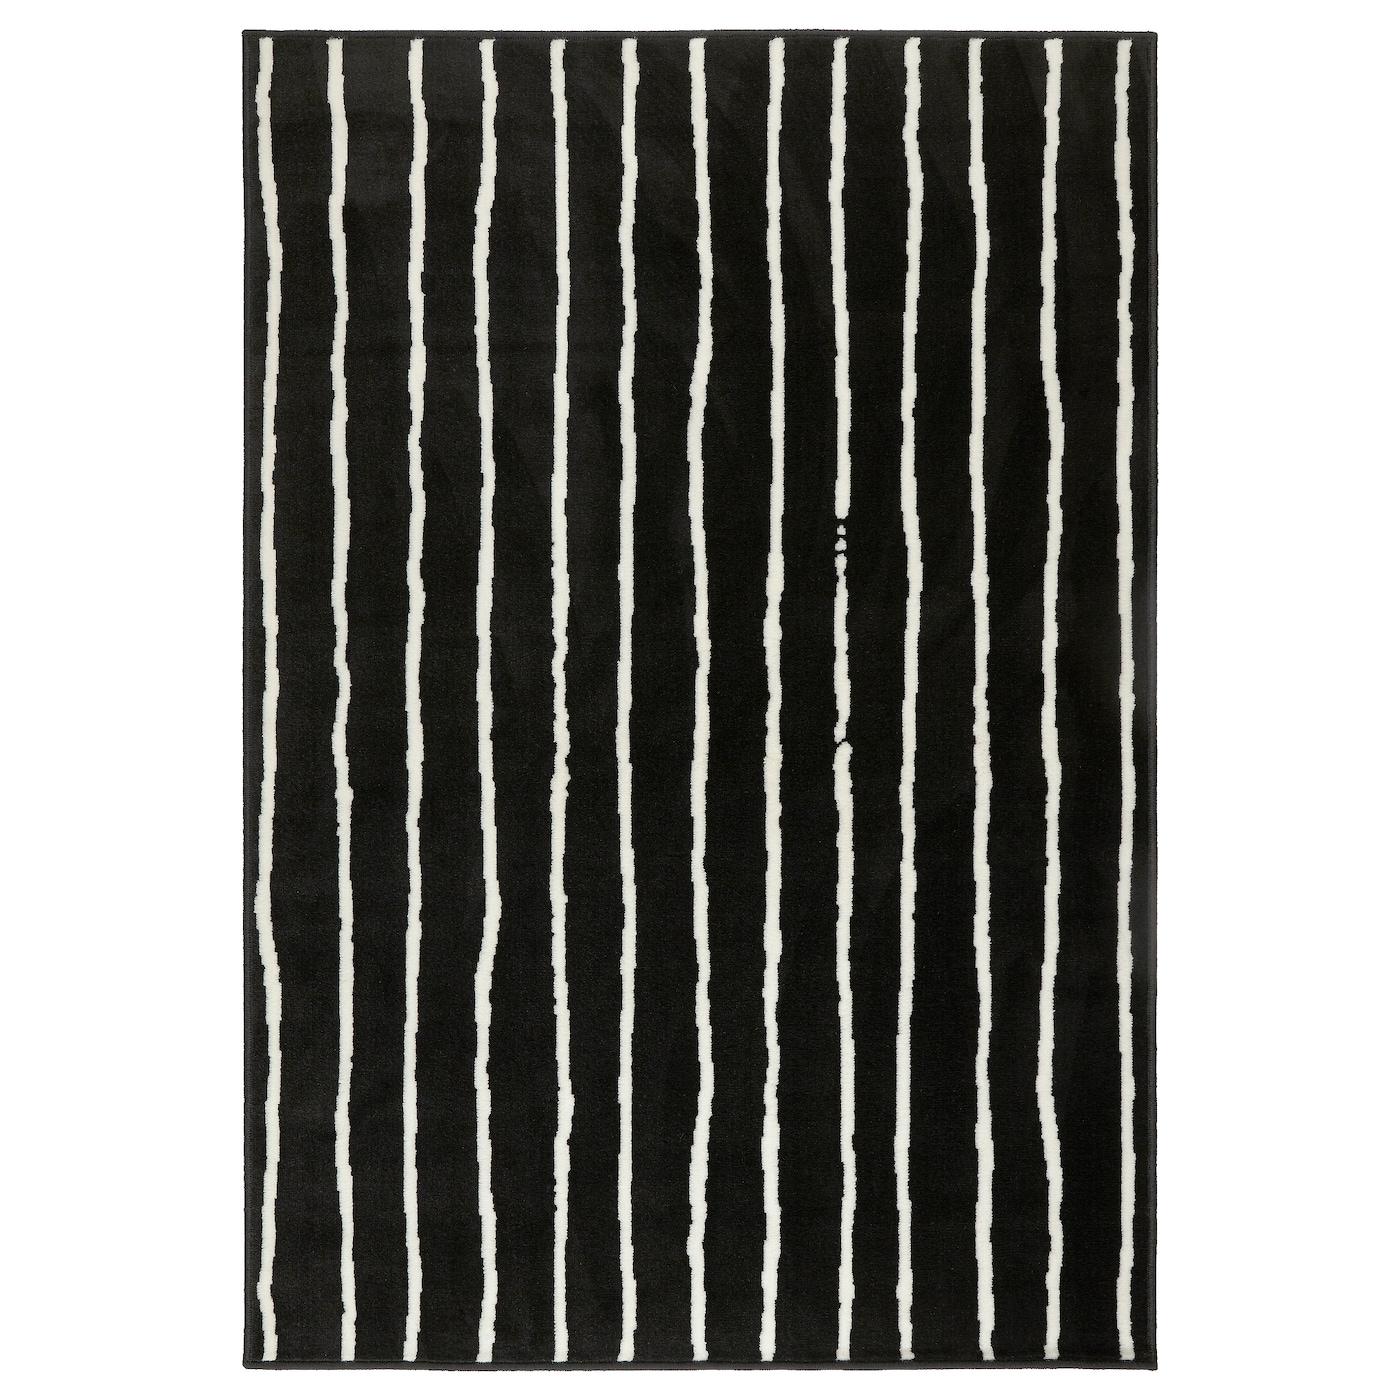 GÖrlÖse Black White Rug Low Pile Ikea